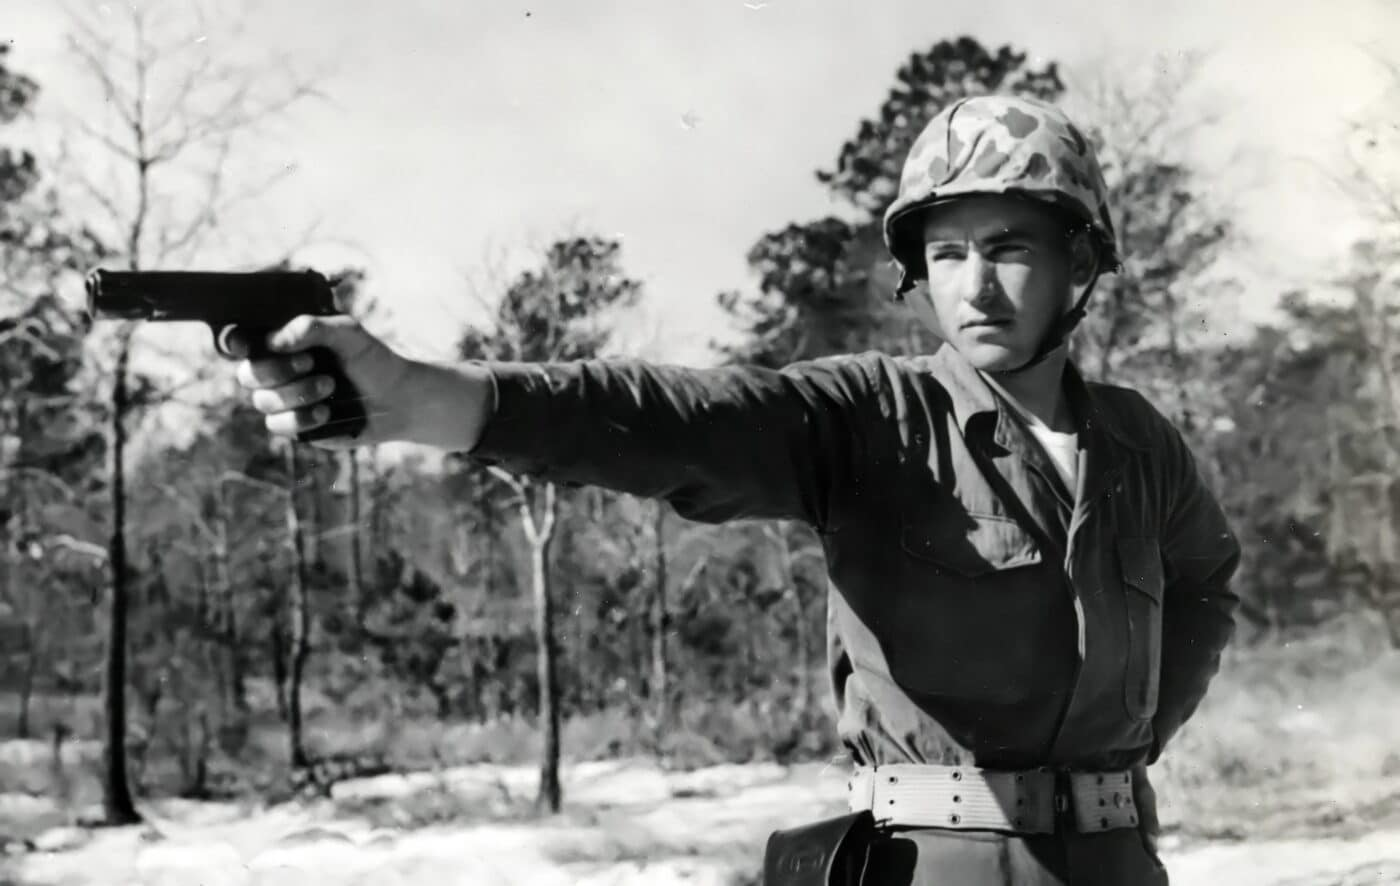 US Marine wielding a M1911 in the Korean War